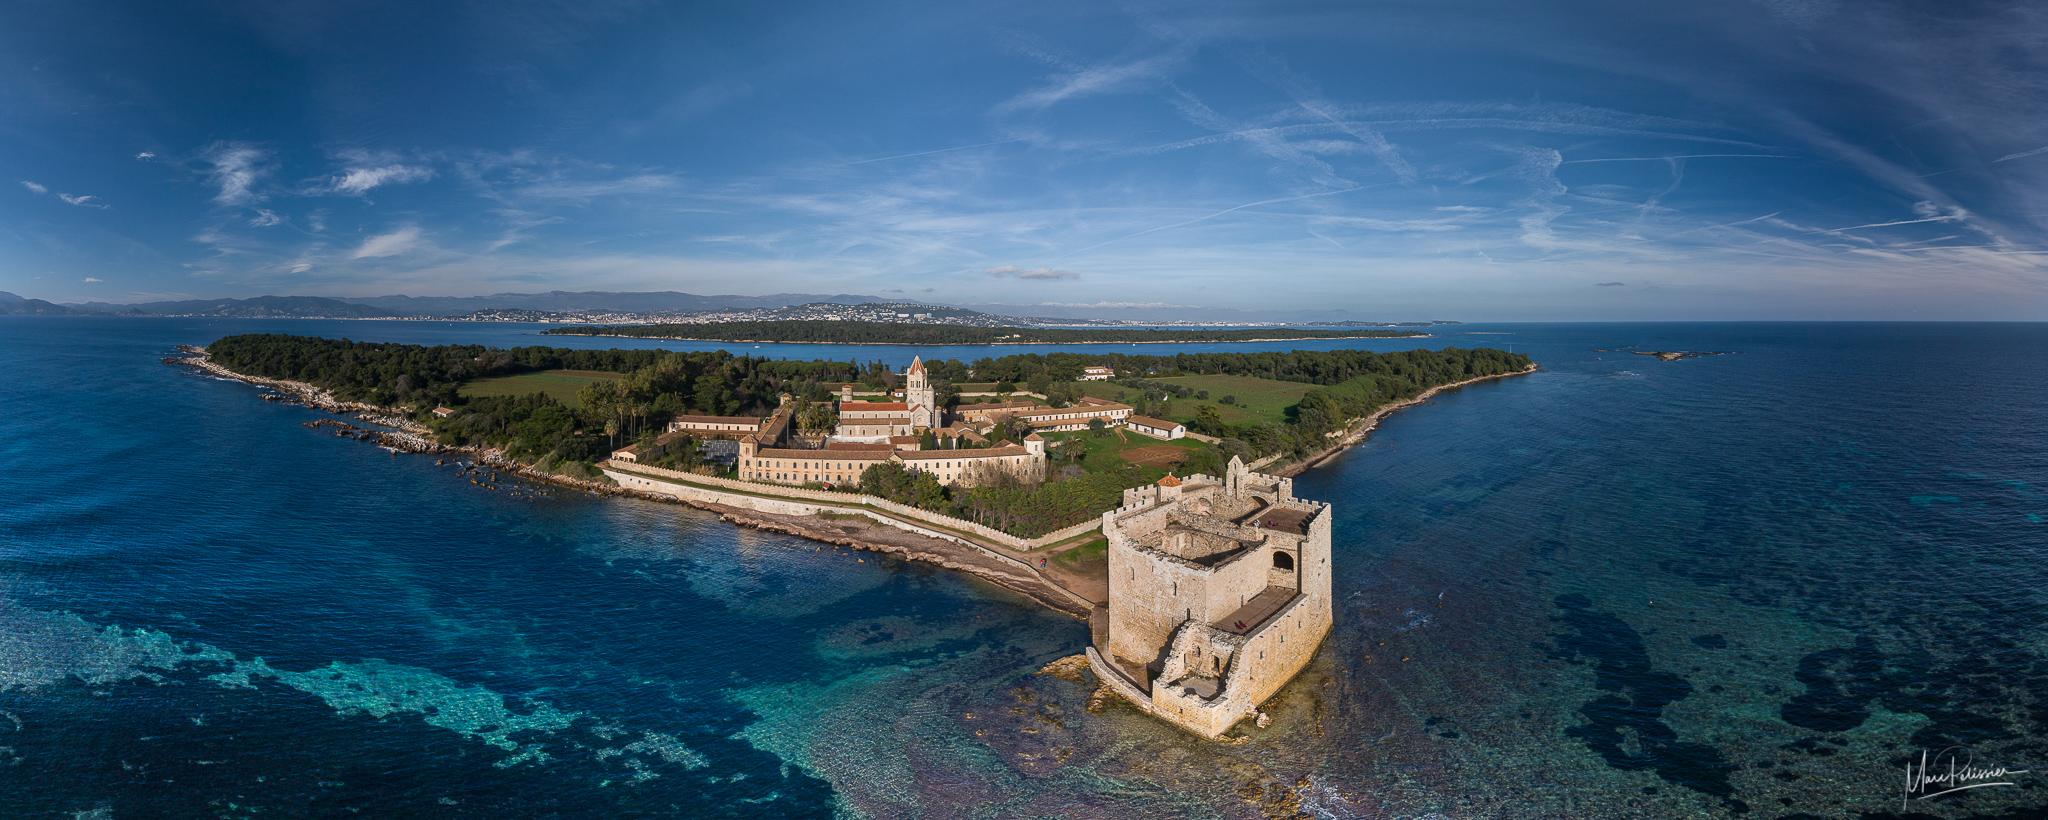 Saint Honorat fortress, Lerins Island, France